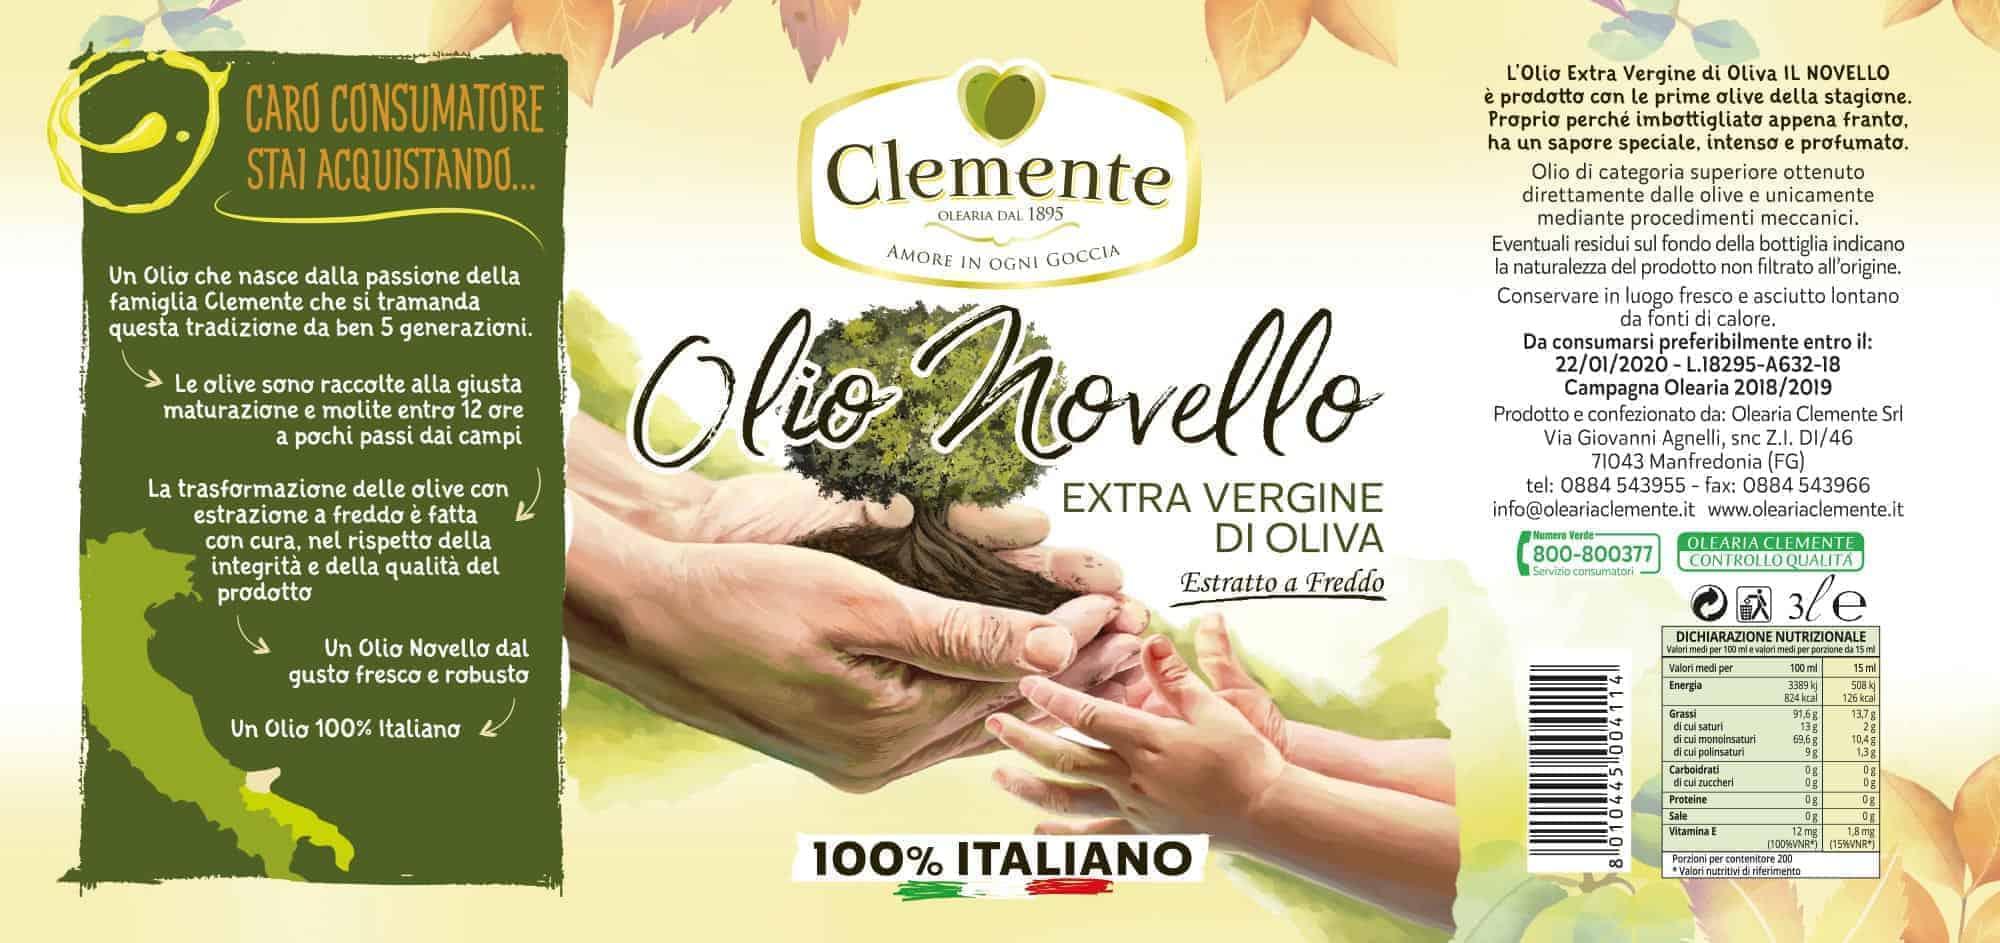 Olio Extravergine 100% Italiano Novello 3 Litri - Etichetta